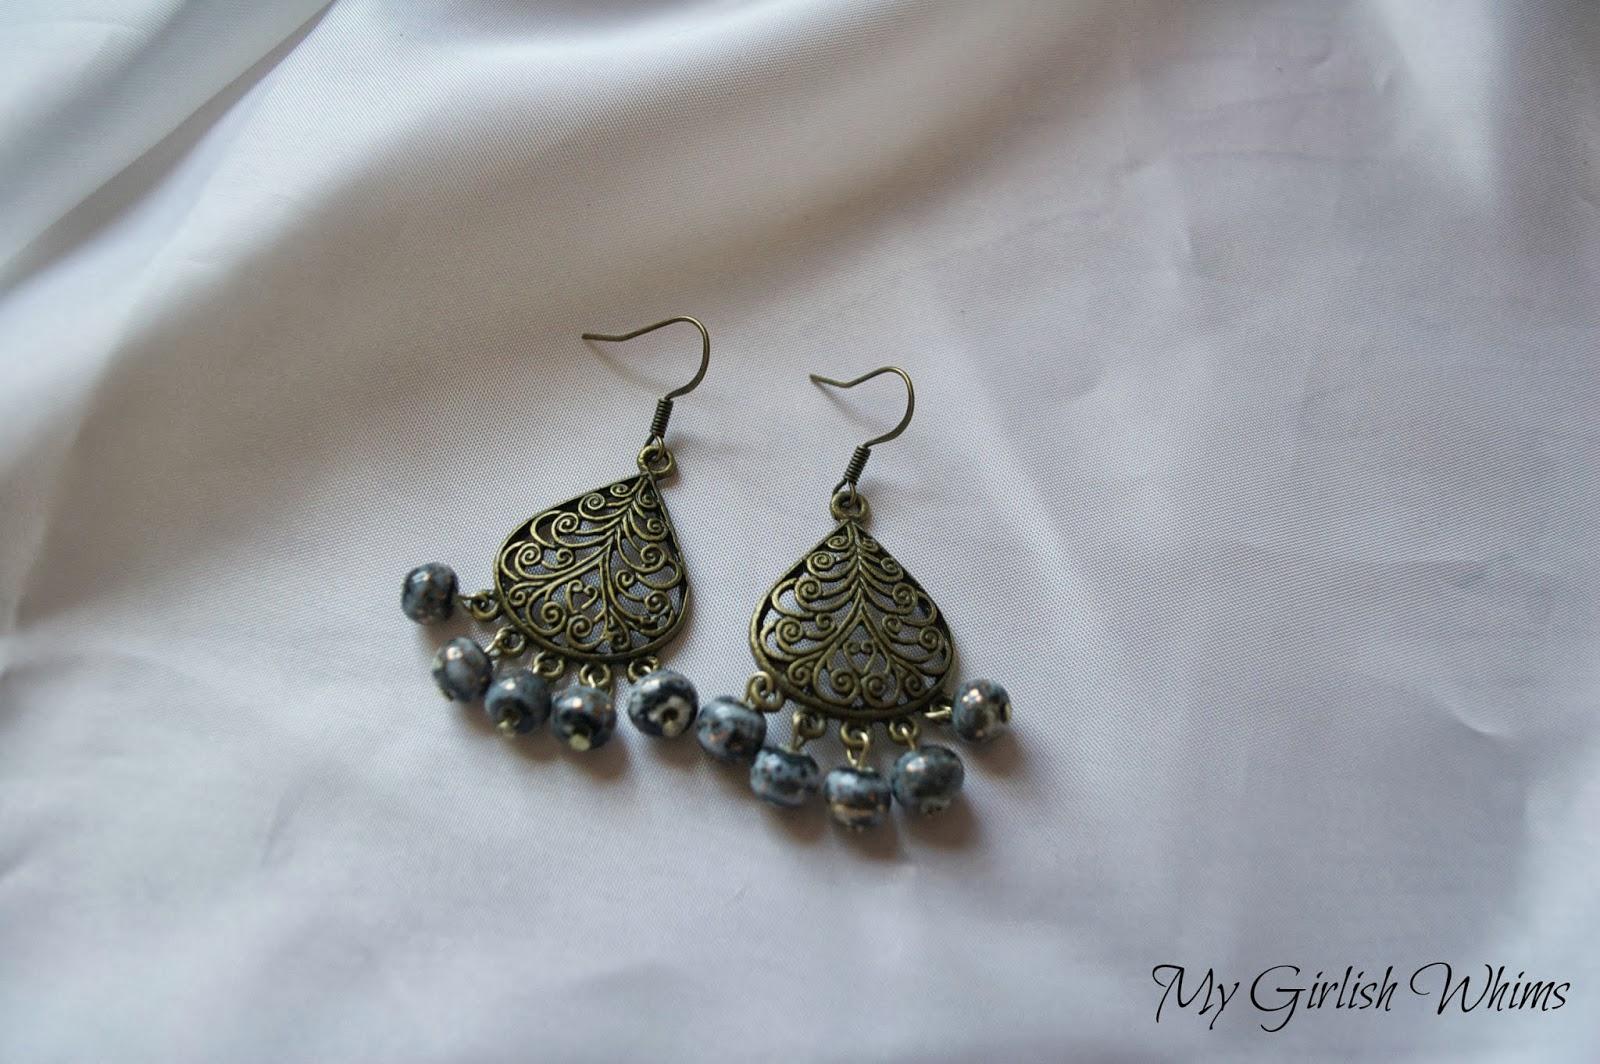 DIY Easy Chandelier Earrings - My Girlish Whims